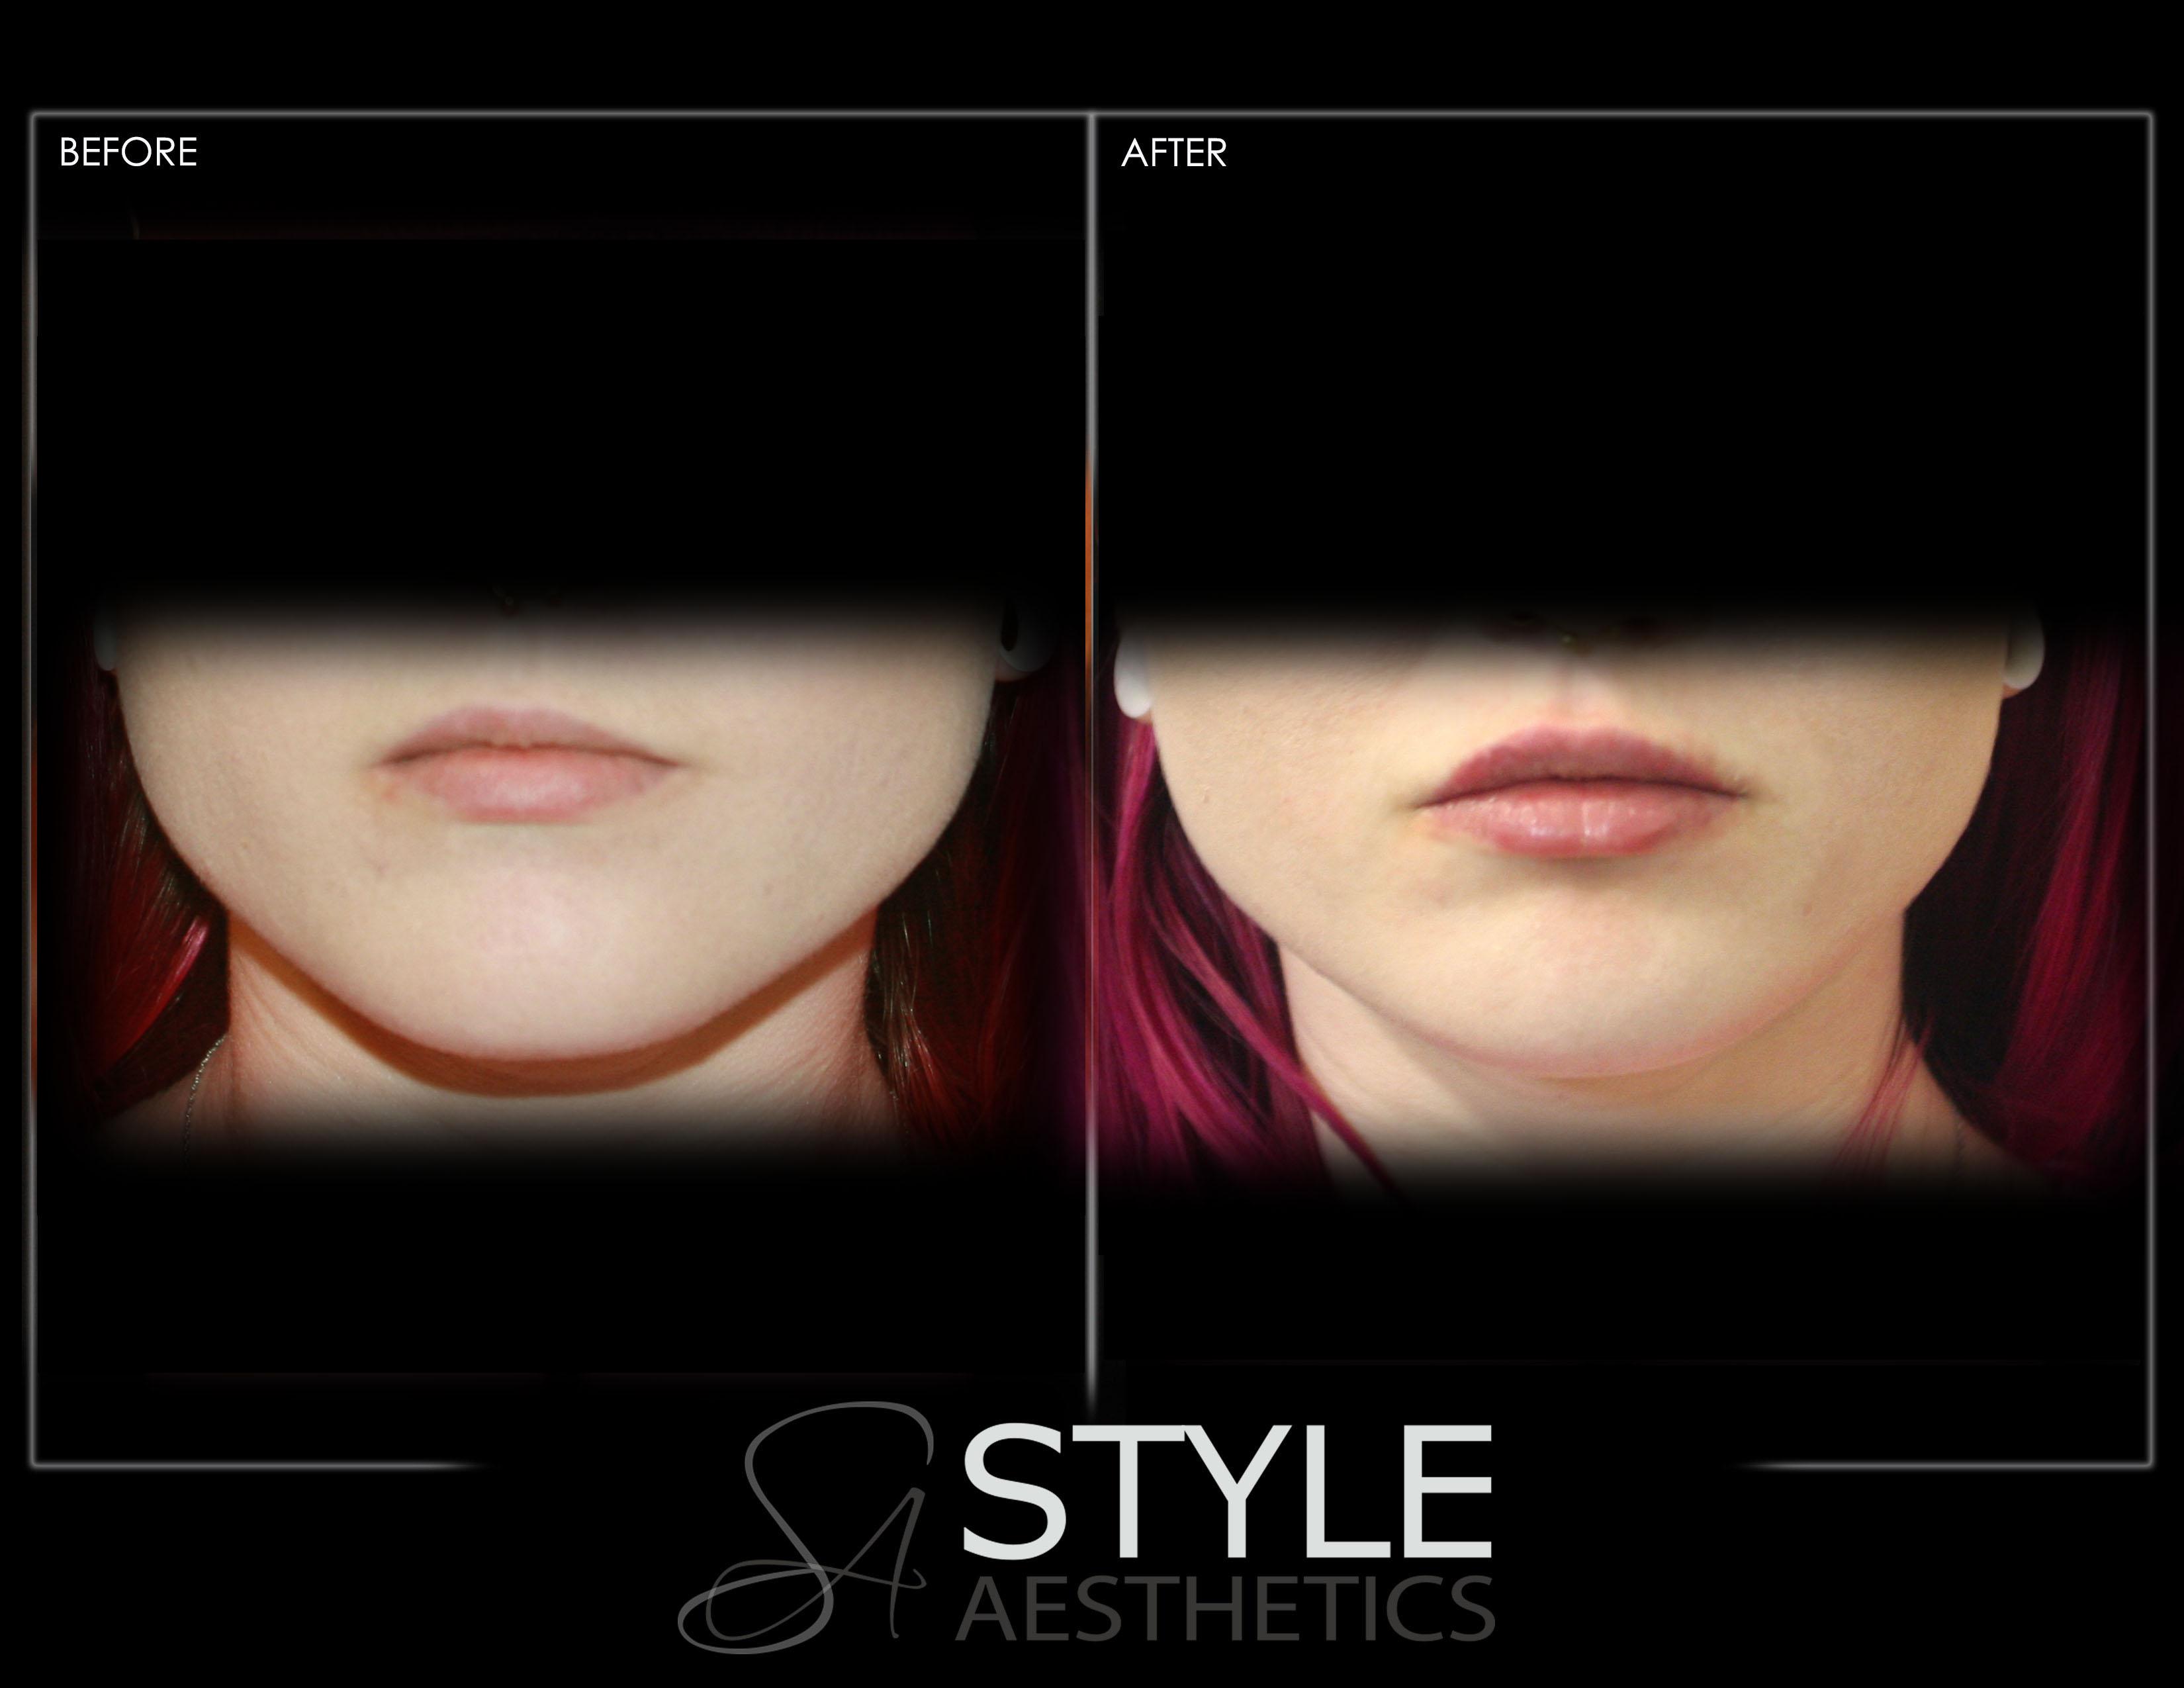 lips, lip filler, lip augmentation, juvederm, restylane, portland, oregon, fullerlips, juvedermportland, pearlportland